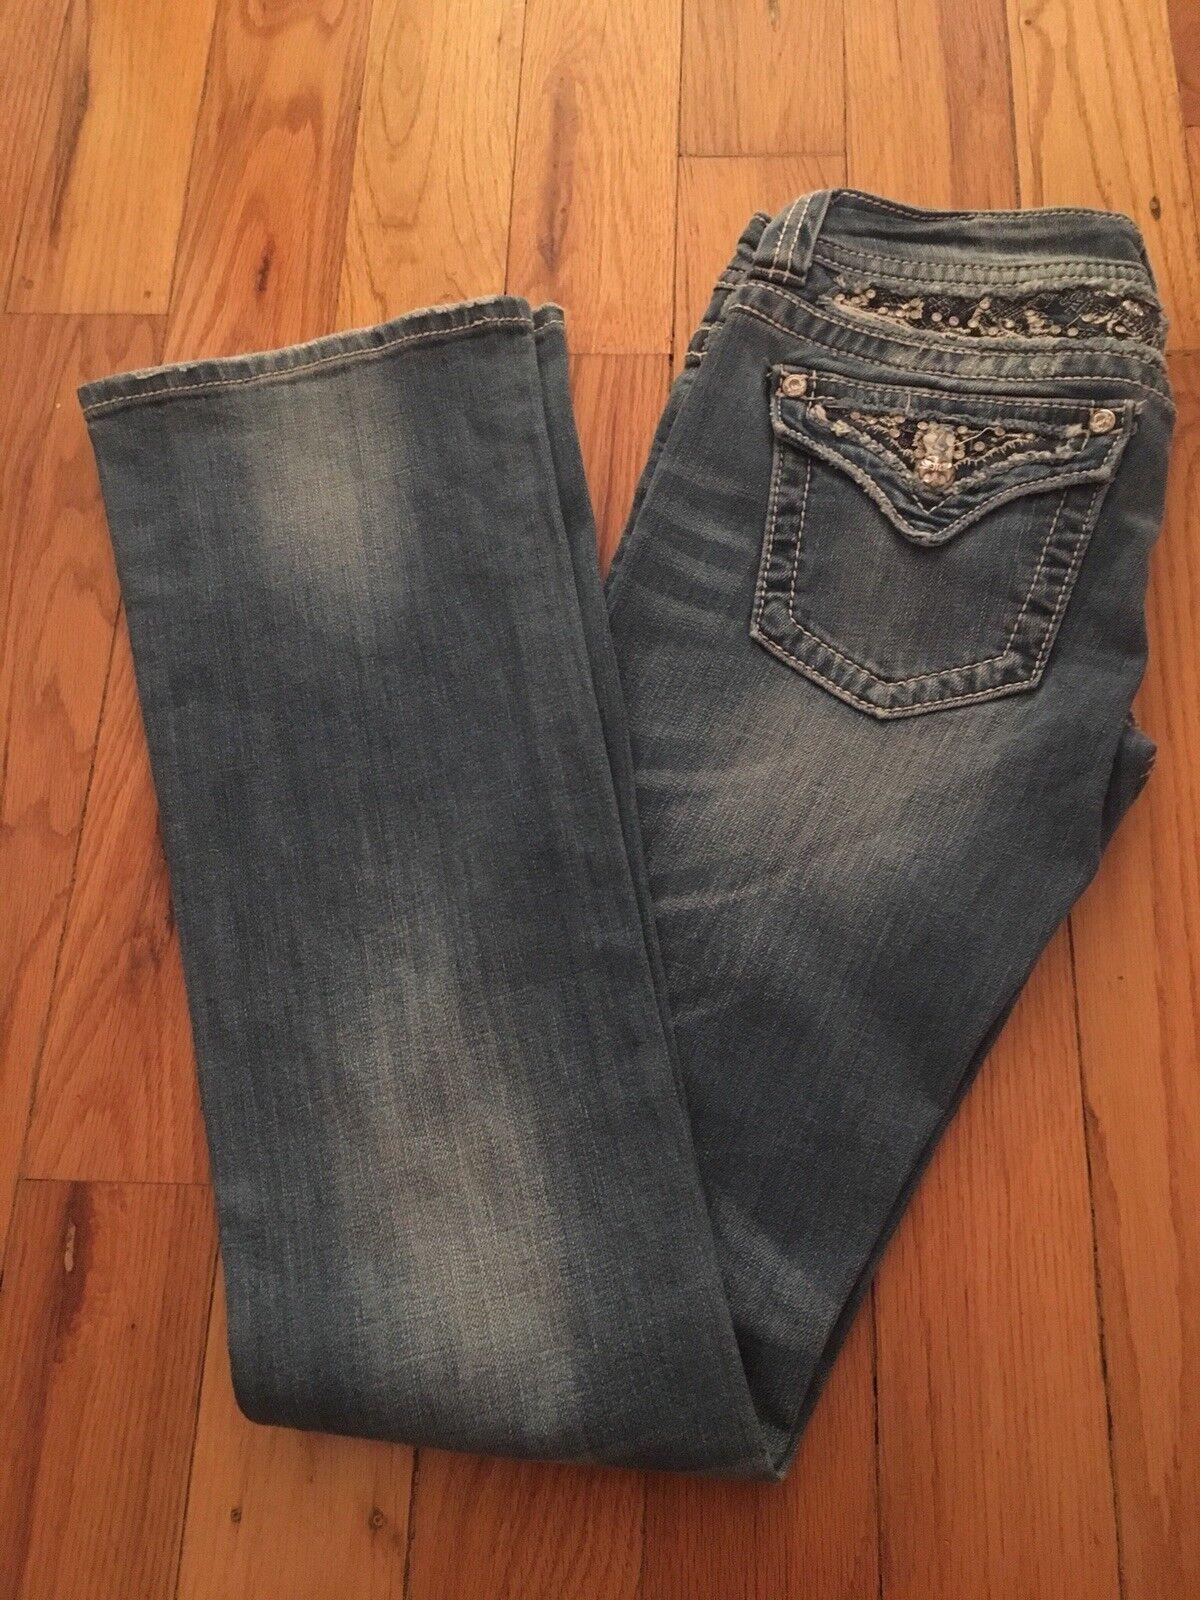 Miss Me Jeans Boot Cut JP5365B2 size 27